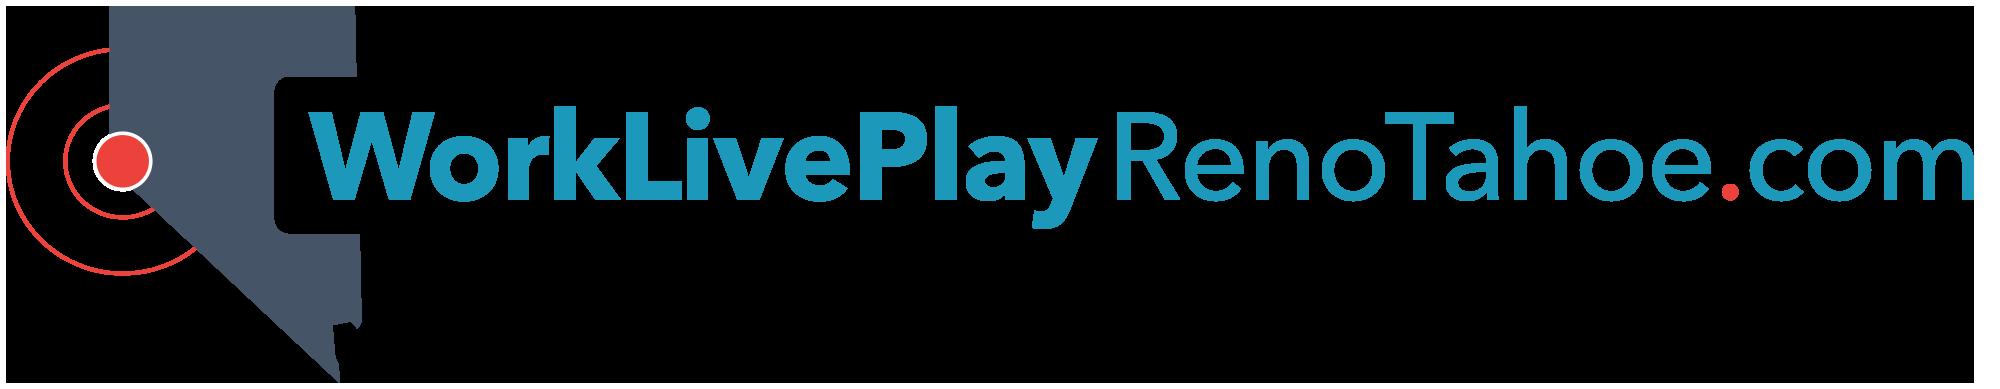 Reno Relocation and Community Guide Logo